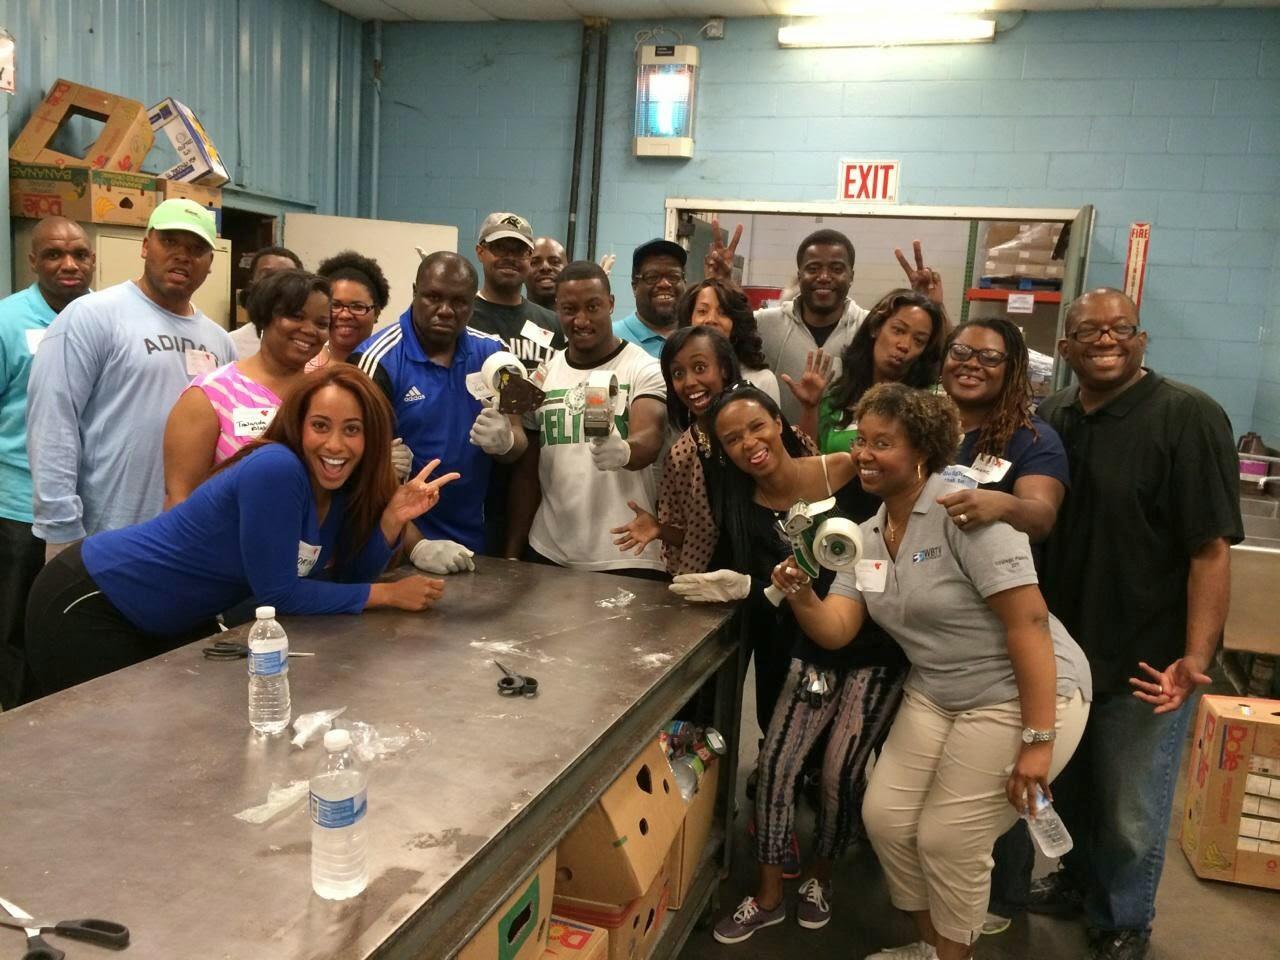 Successful Community Service Day